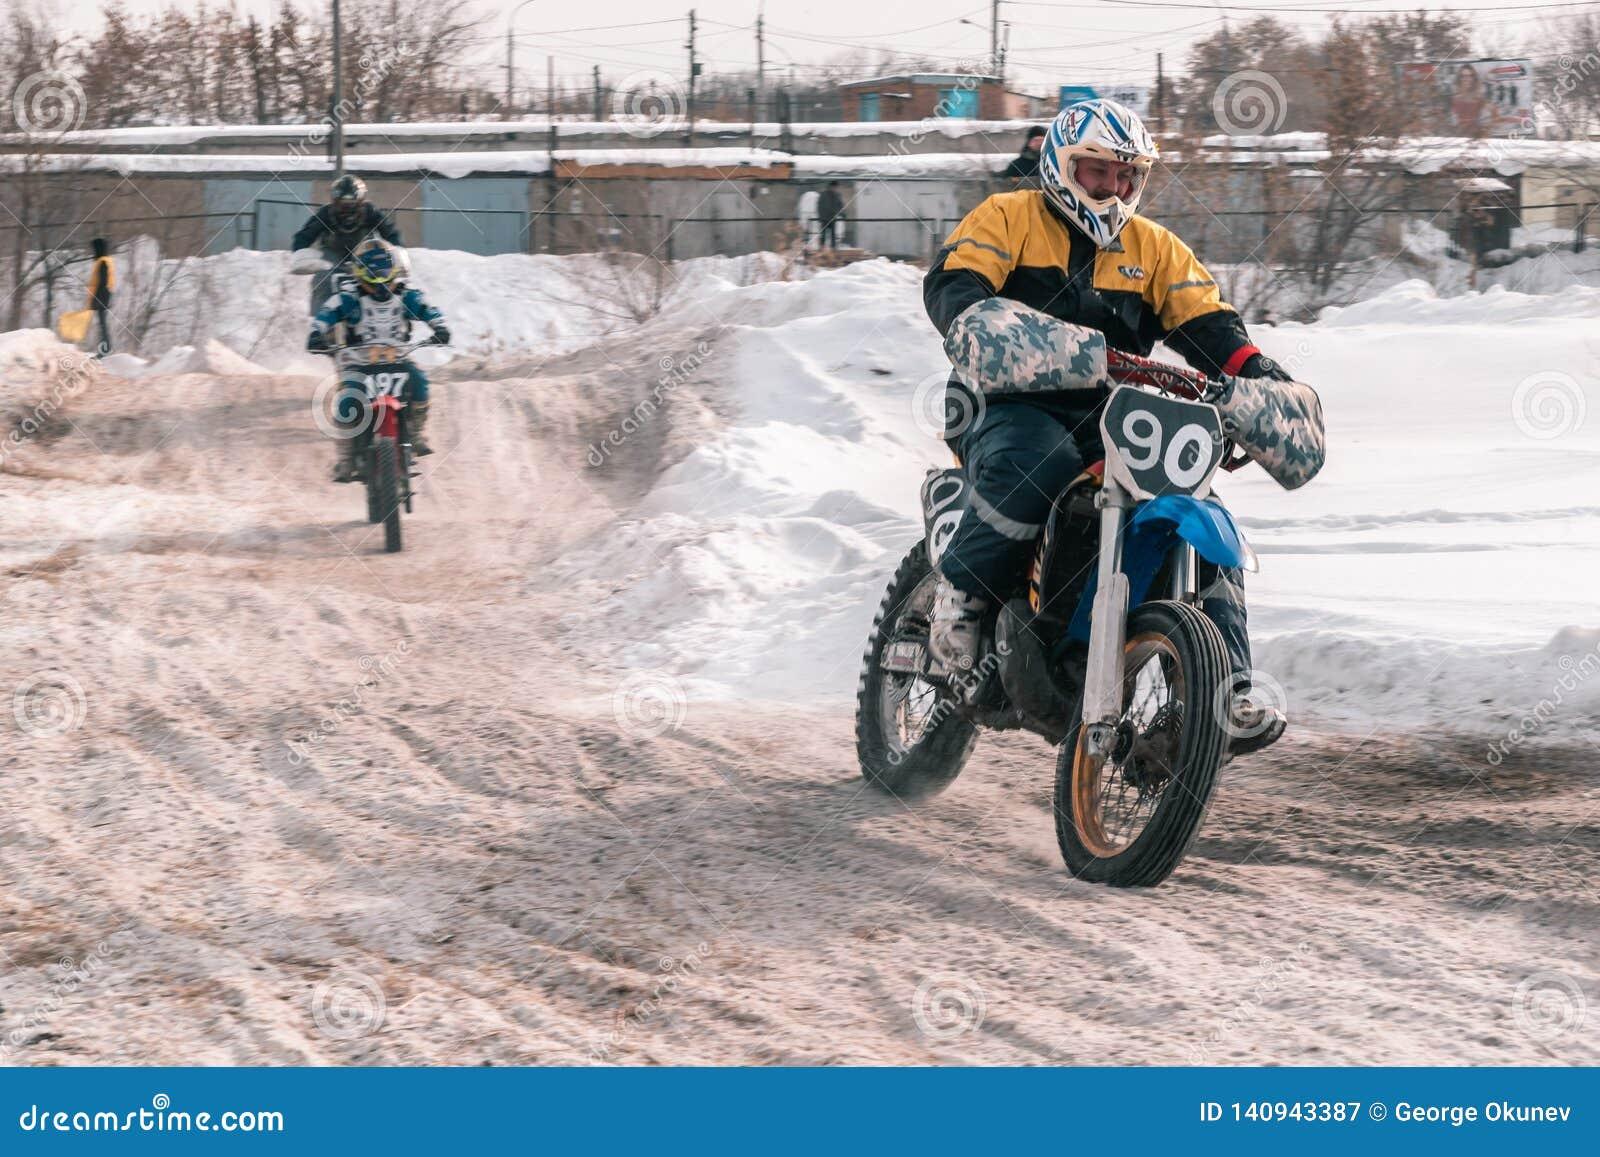 Motocross tournament in winter in Siberia Omsk